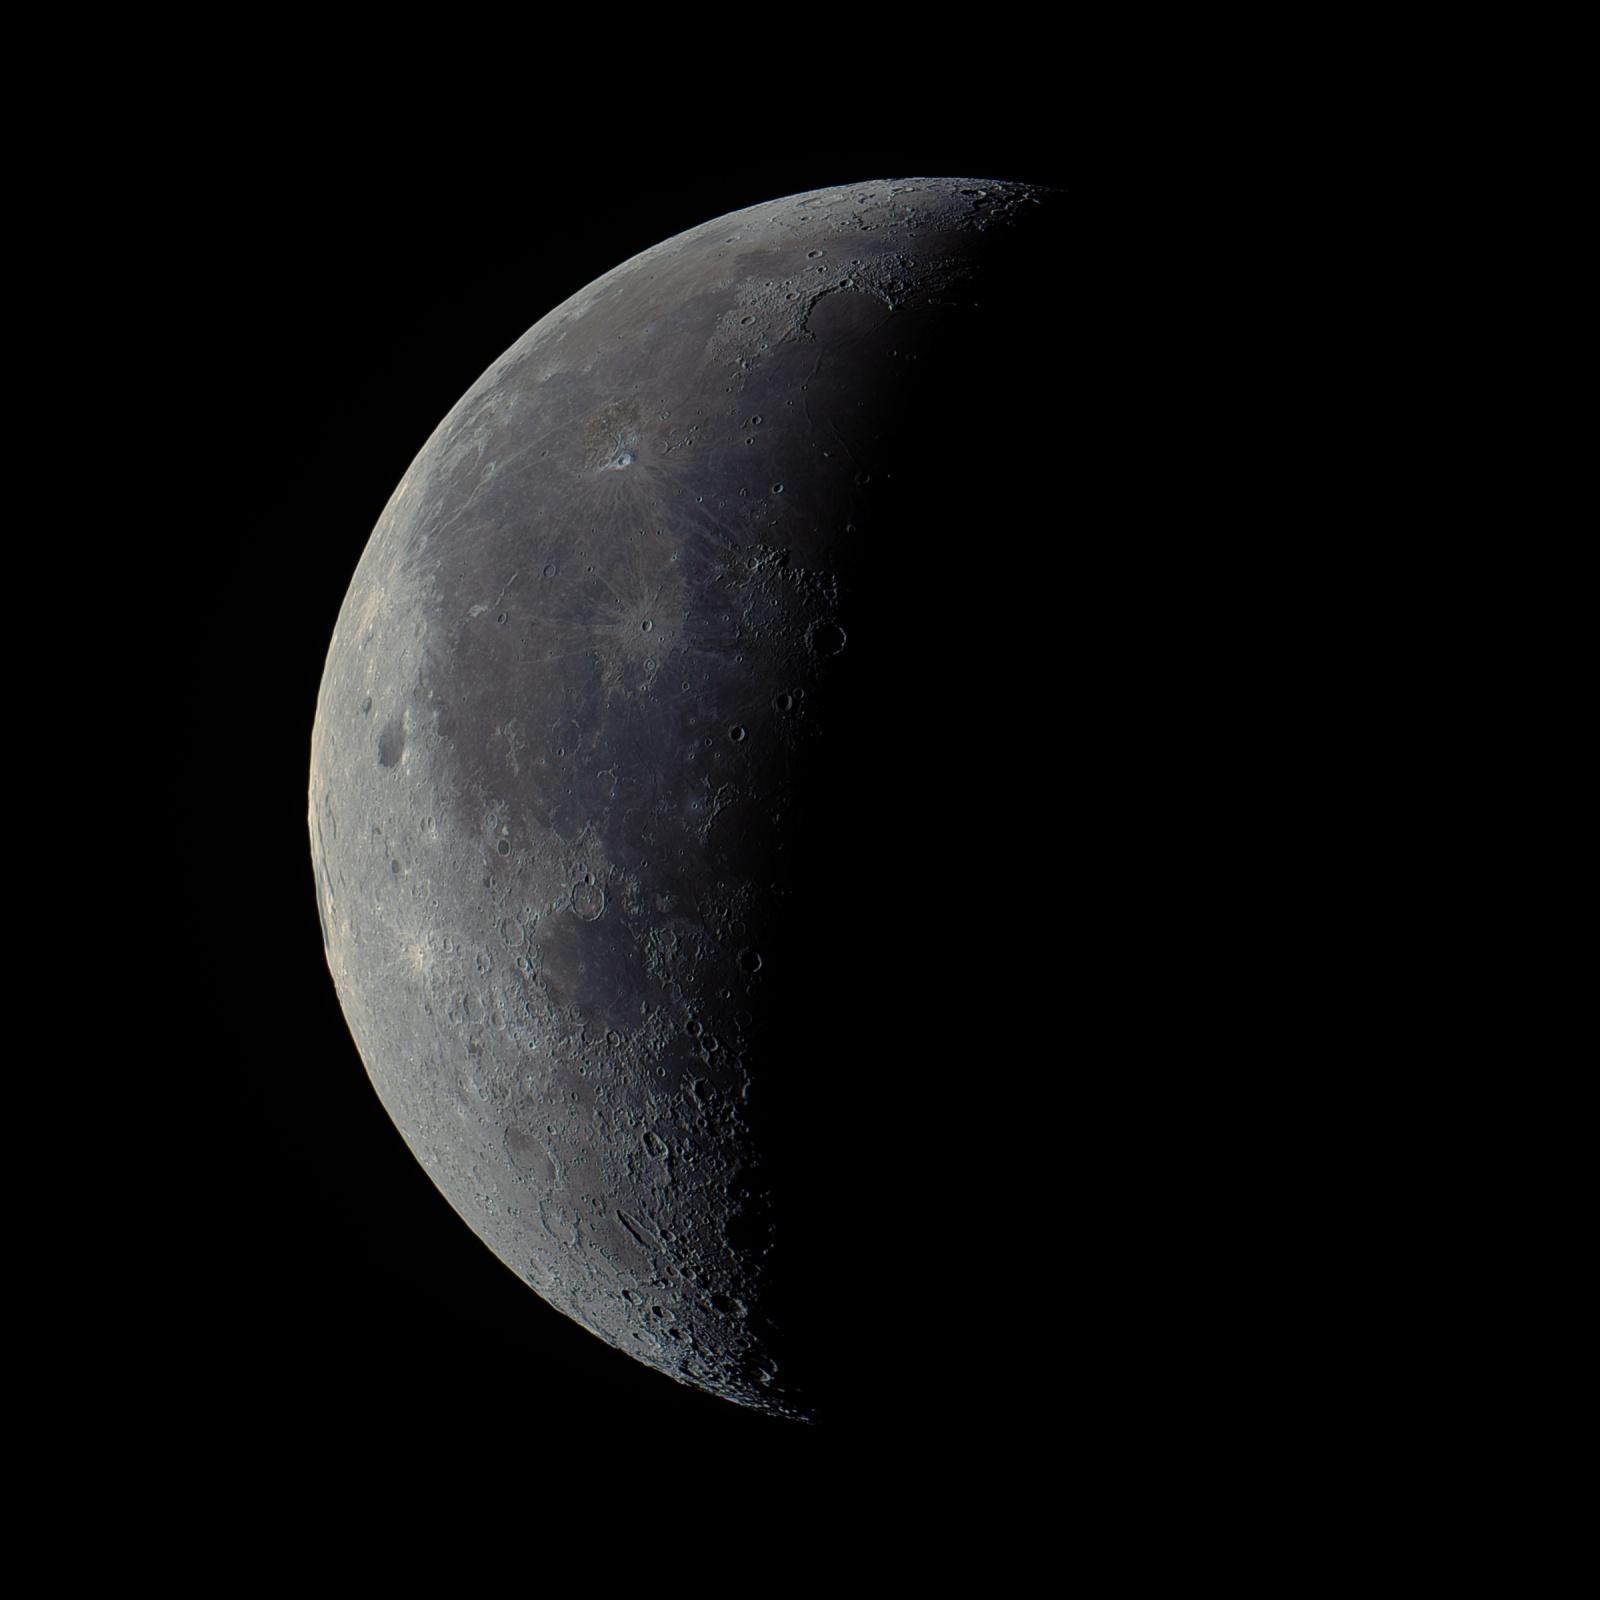 moon_crop_2400_2400.thumb.jpg.b8d041e8b32574927bbee73b3f6b22ea.jpg